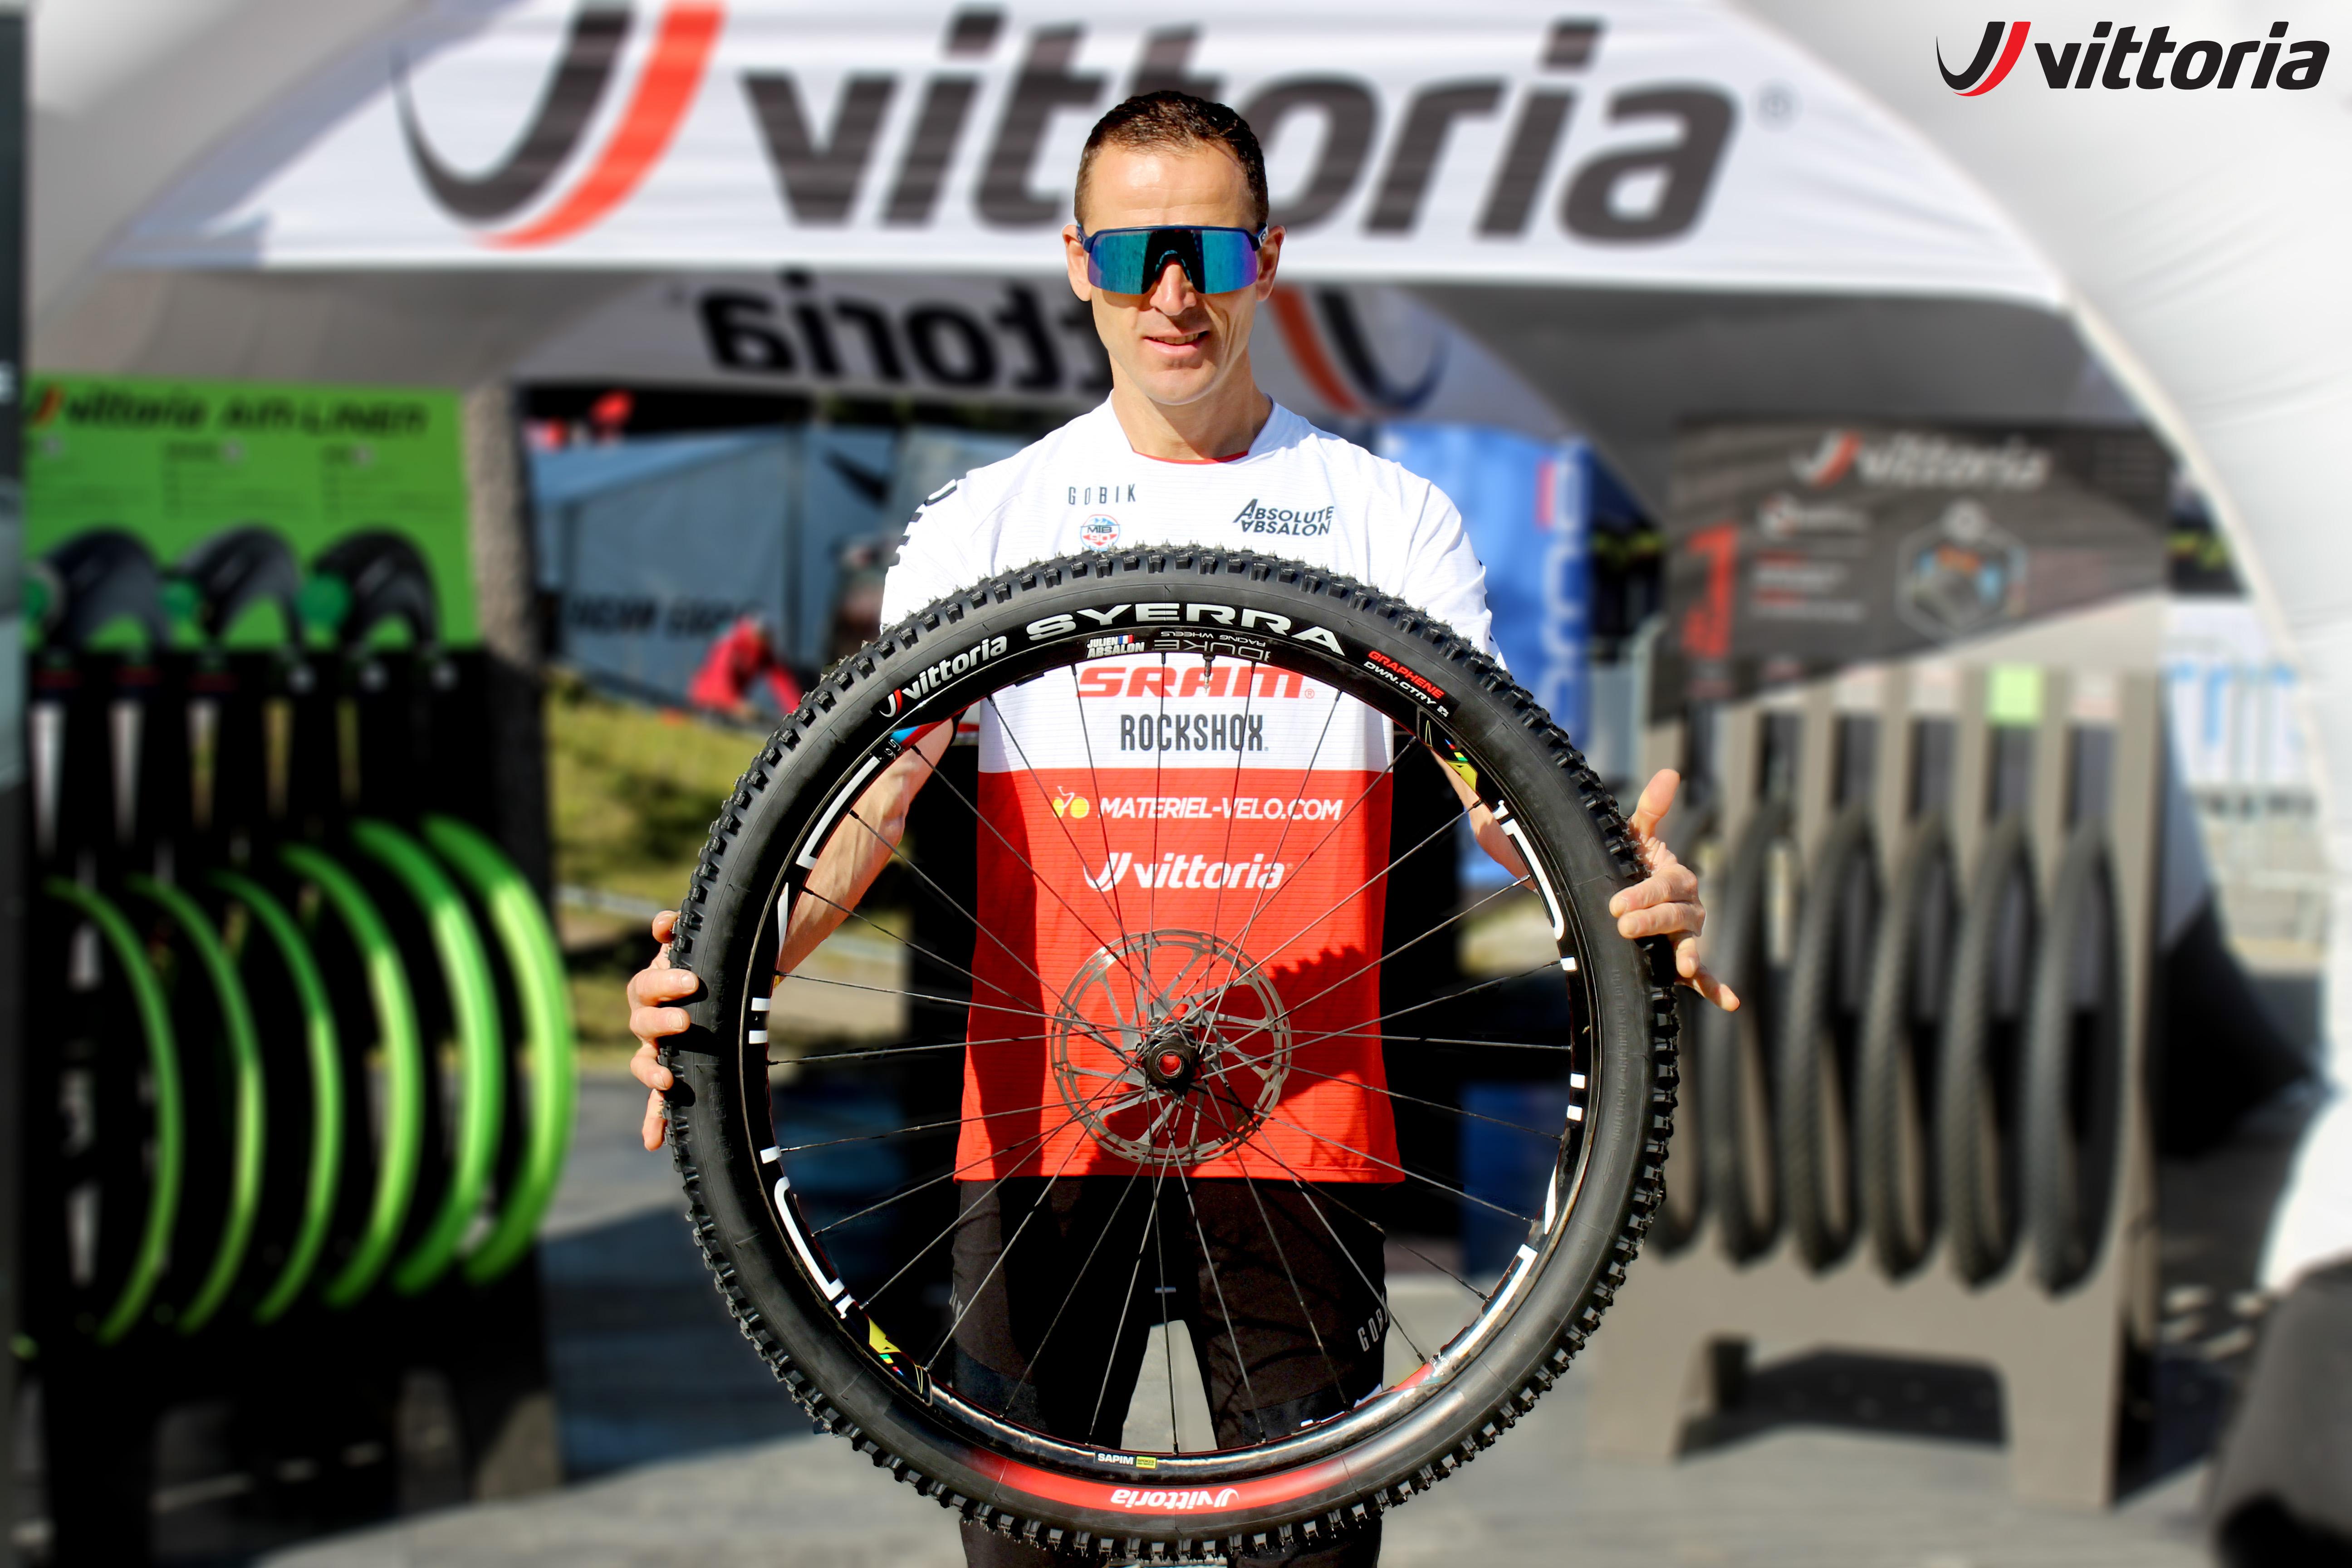 Julien Absalon with Syerra Tyre 02